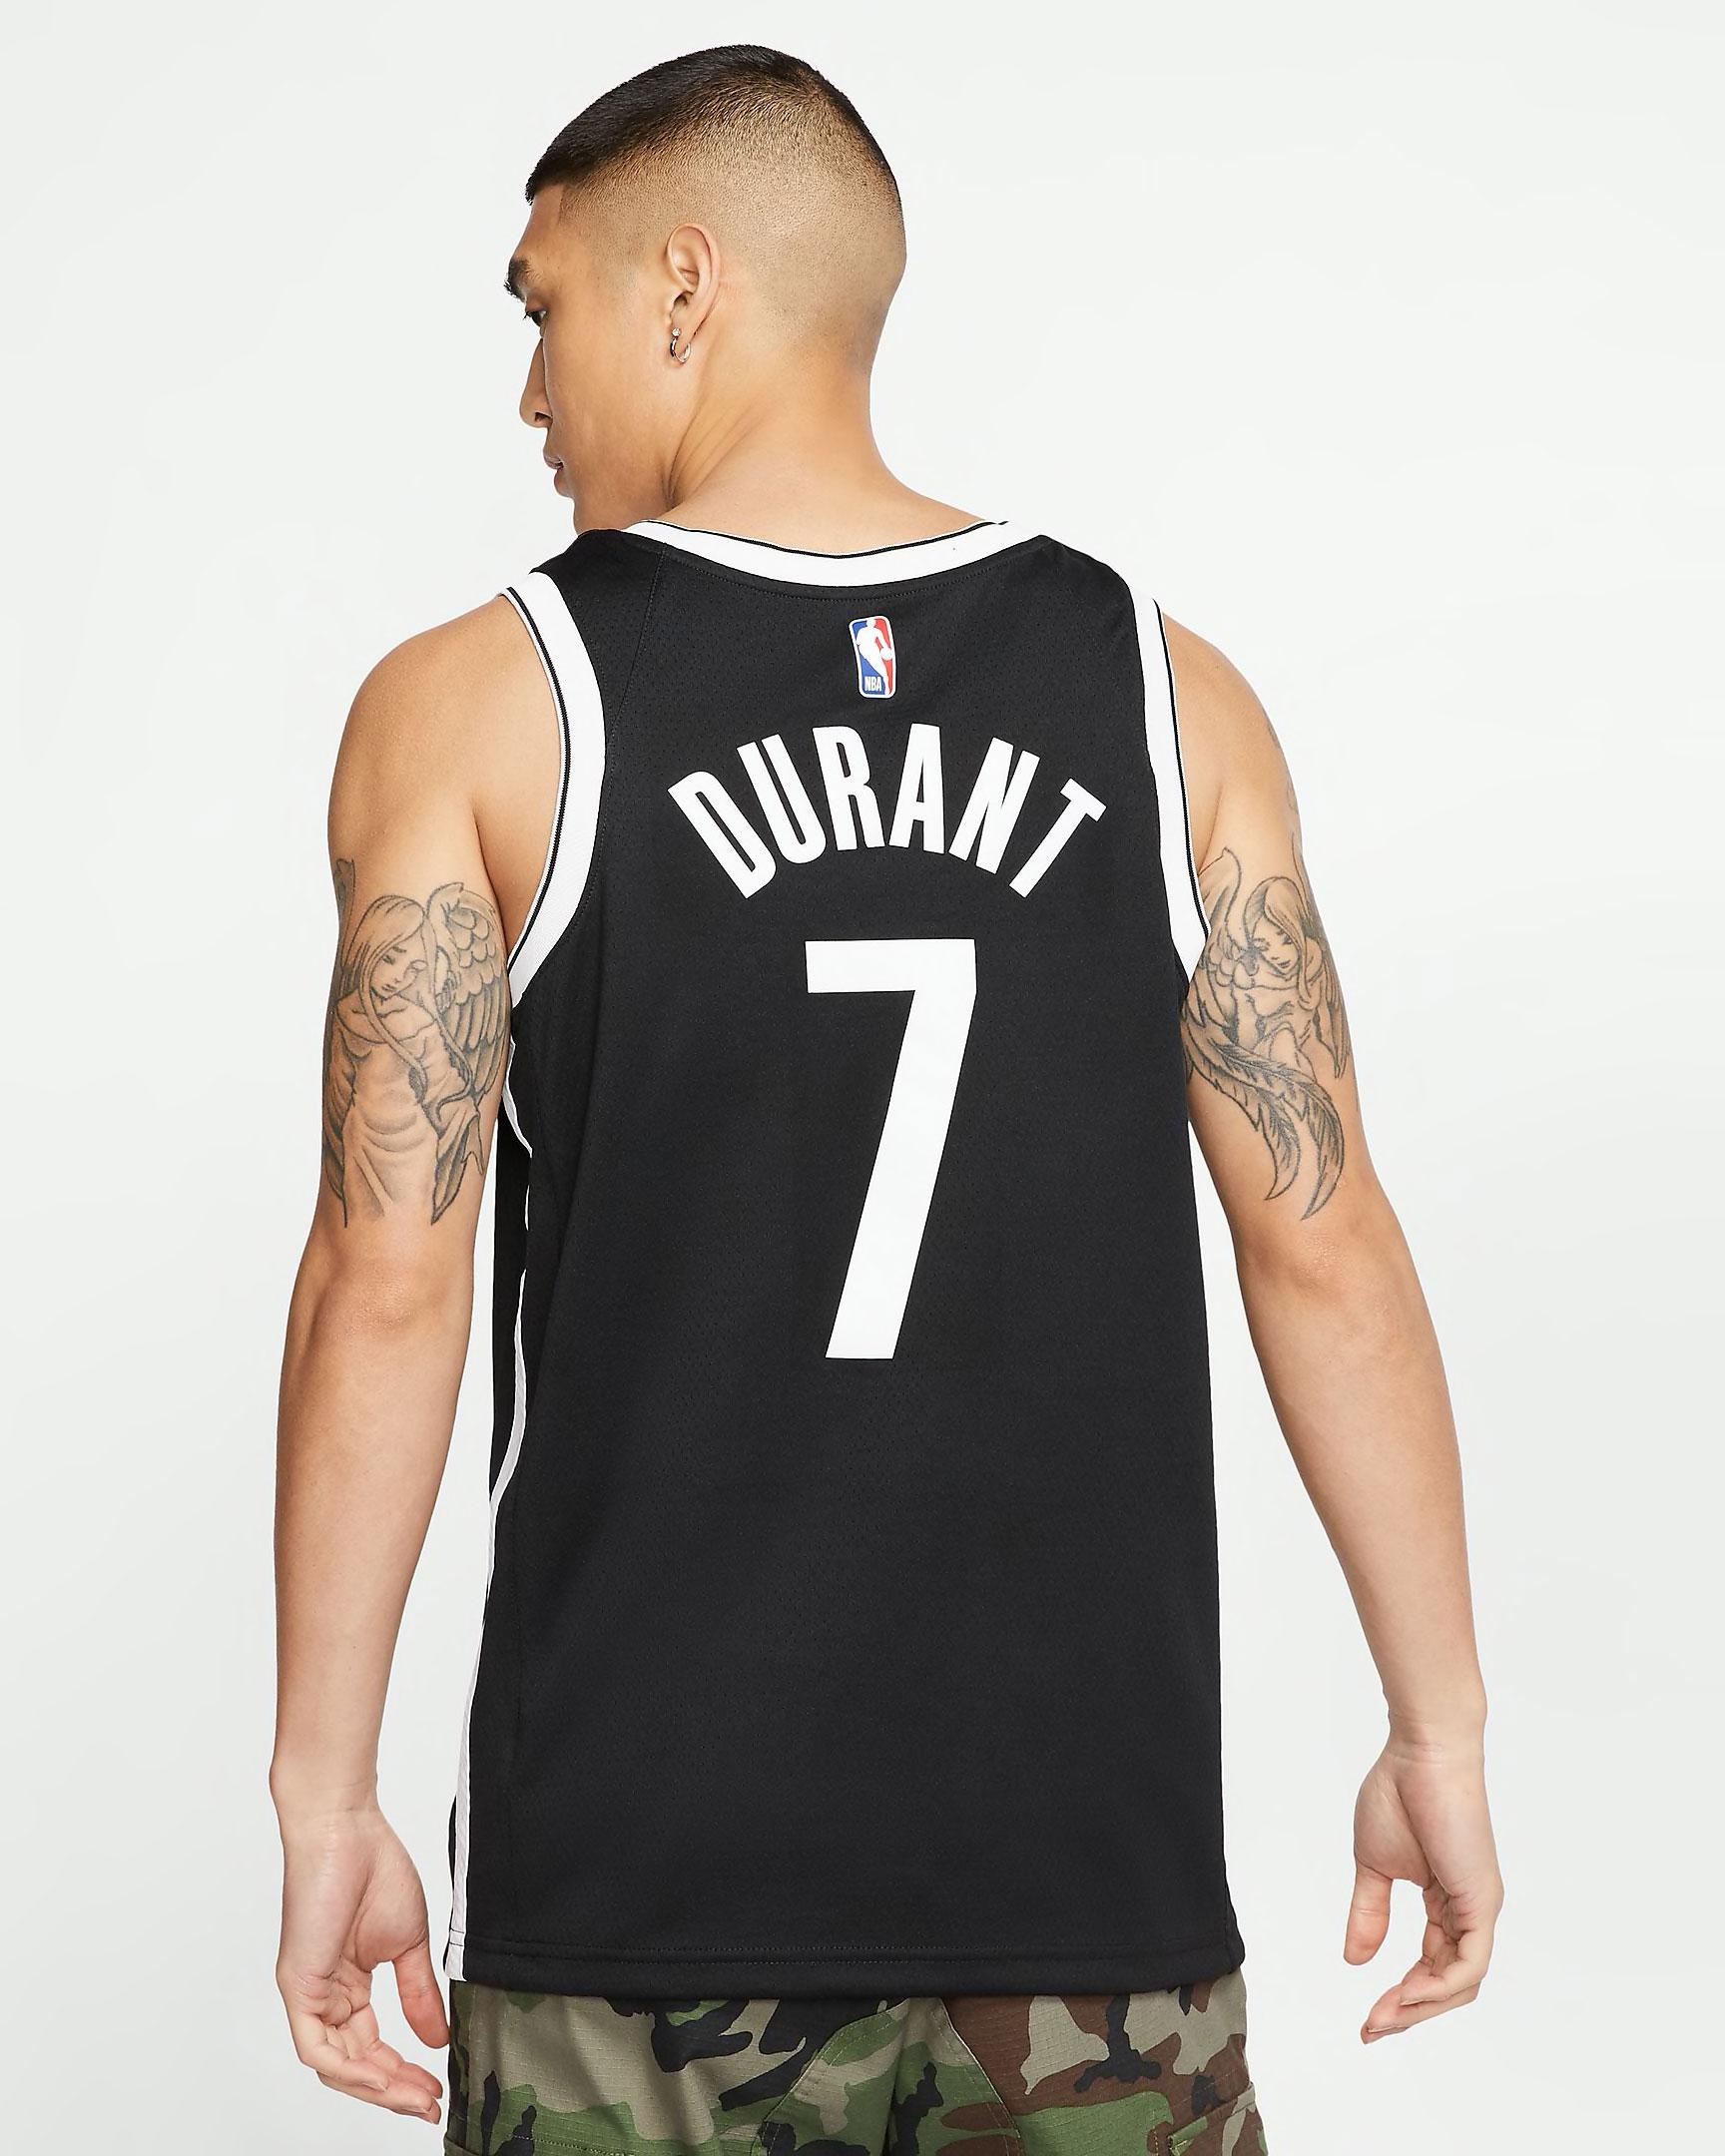 nike-kd-13-black-white-kevin-durant-nets-jersey-2